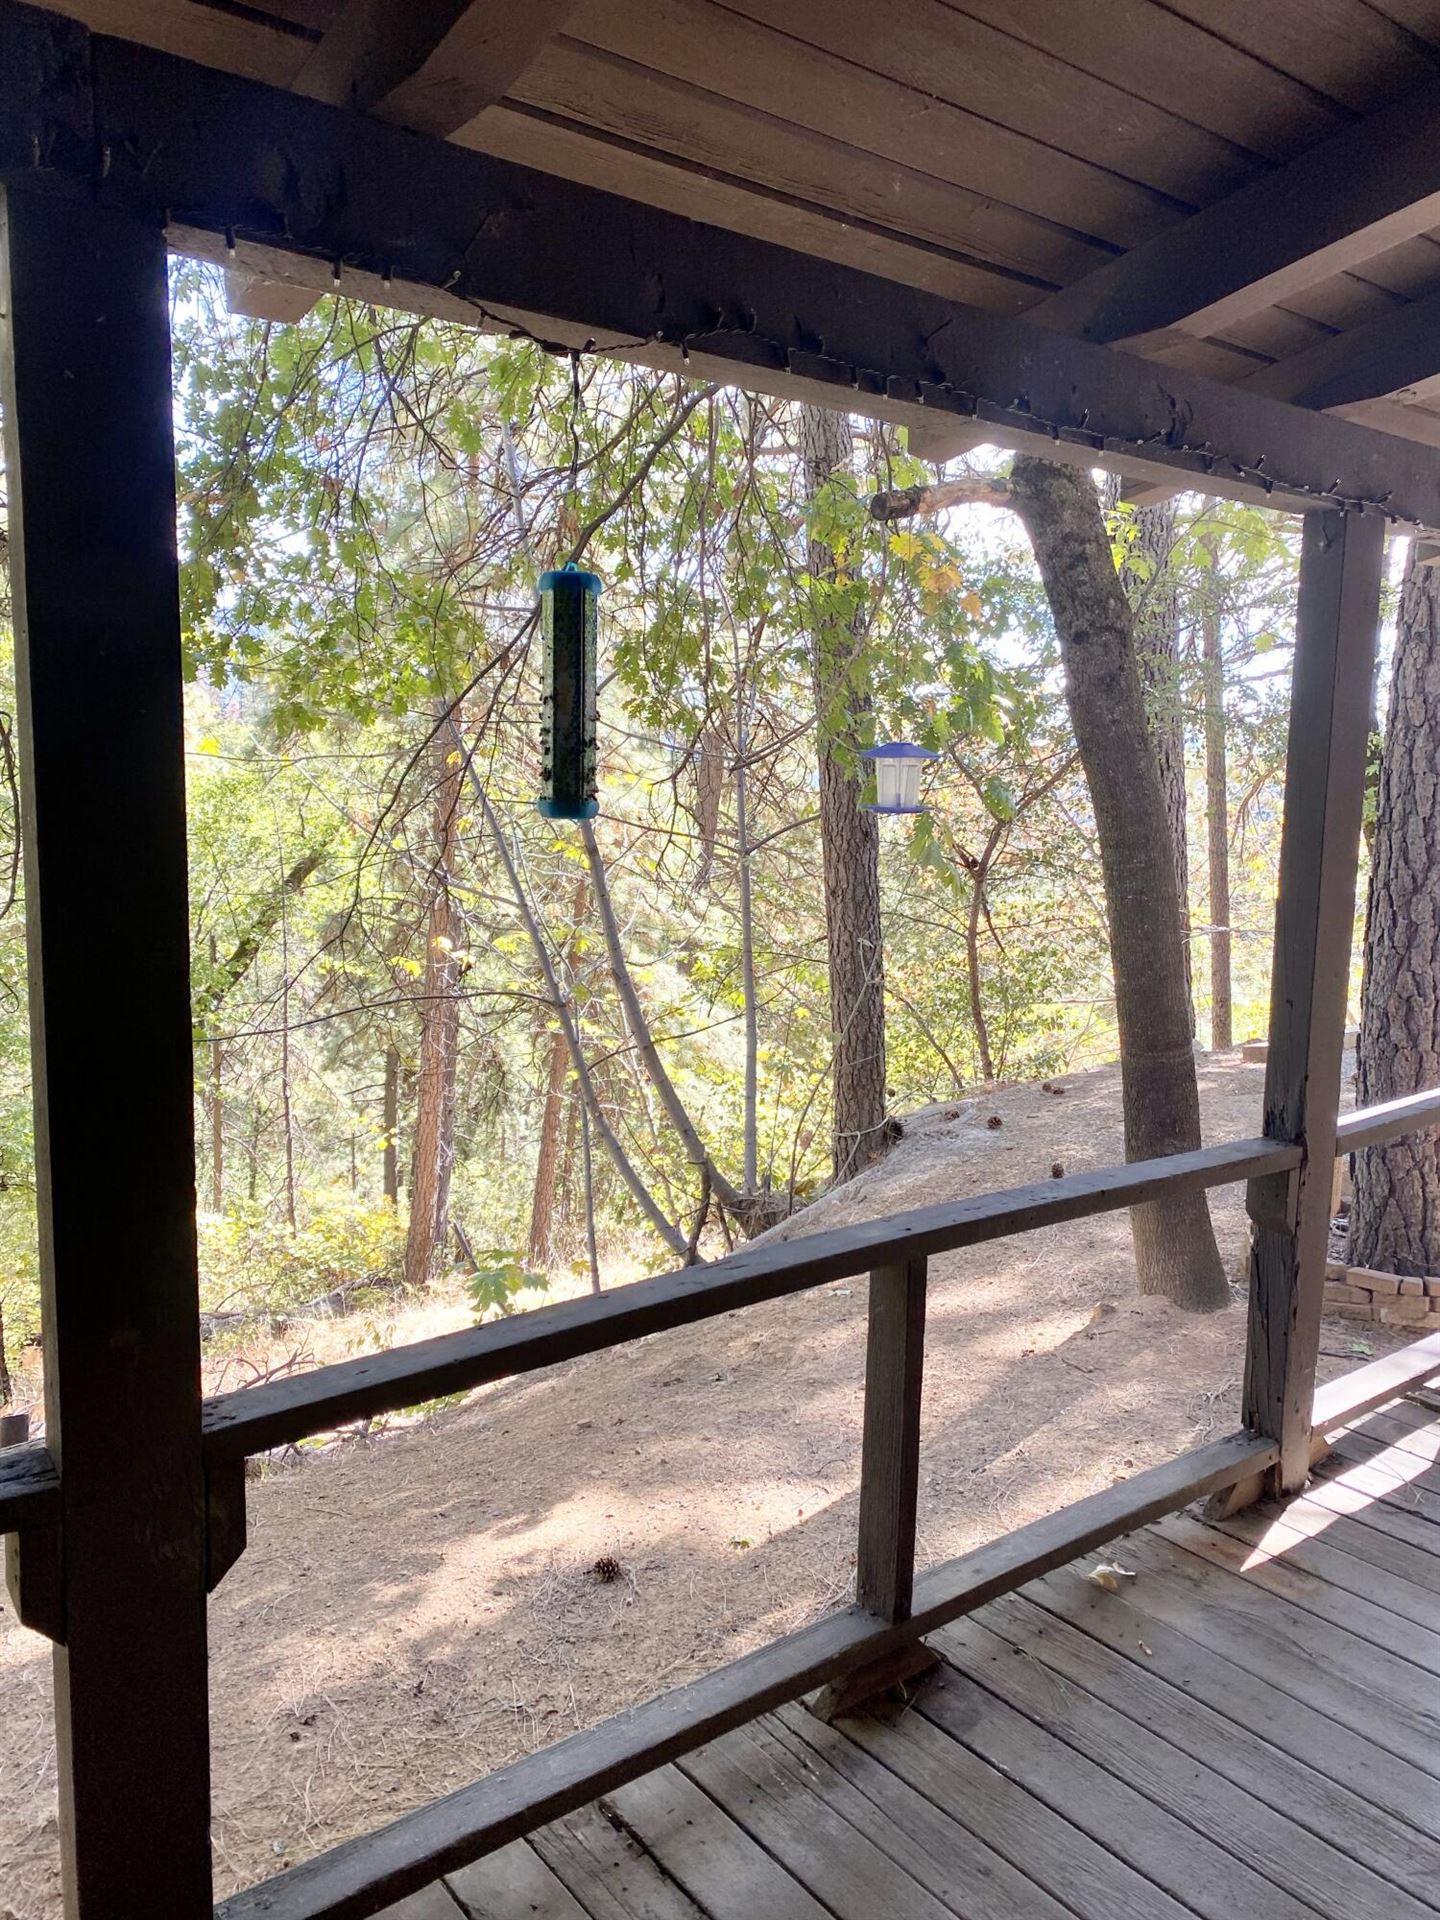 Photo of 18407 Skyline Dr, Lakehead, CA 96051 (MLS # 21-4893)